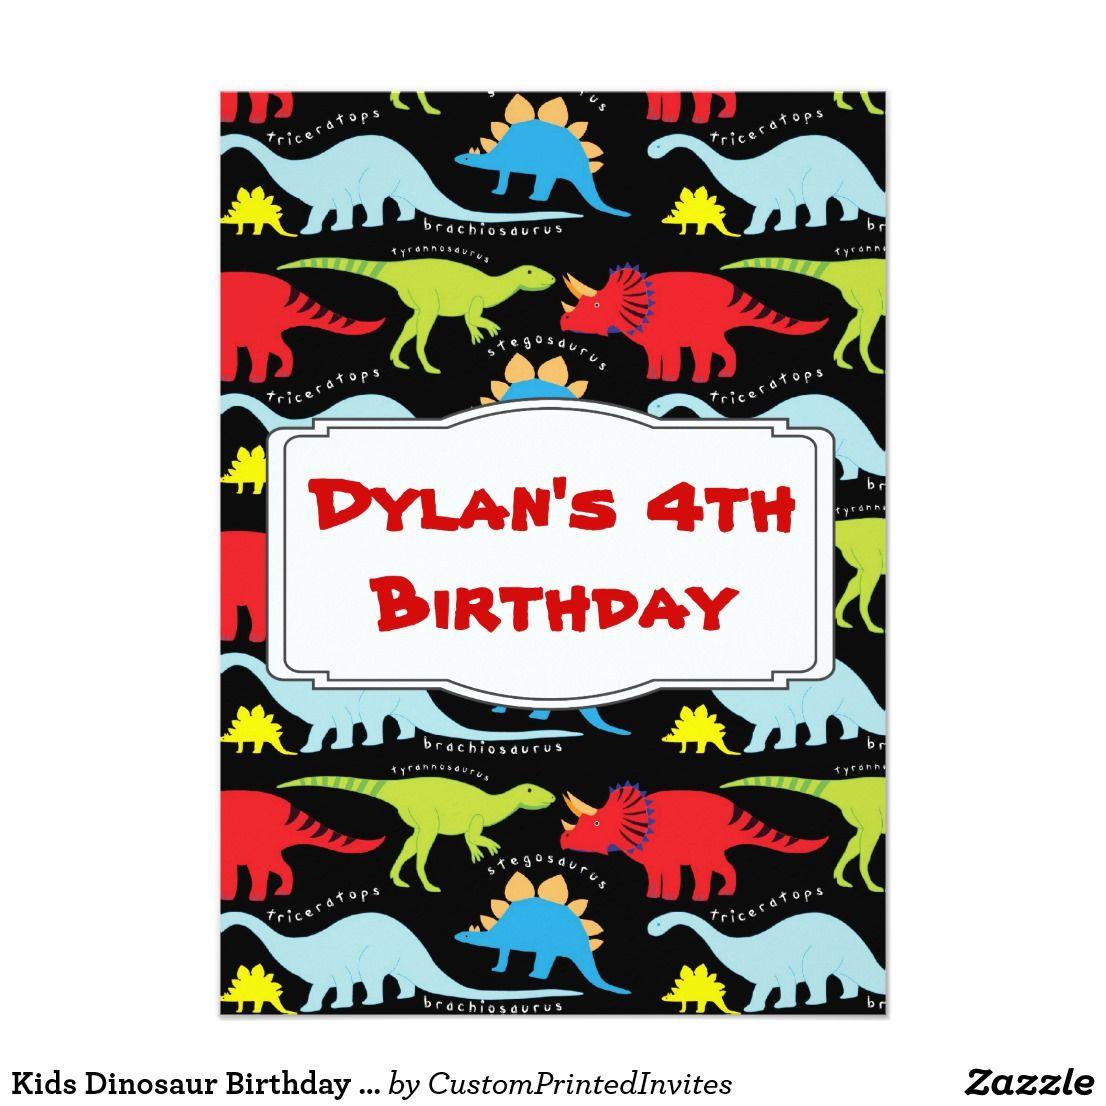 Kids Dinosaur Birthday Party Invitations   Kids dinosaurs, Dinosaur ...